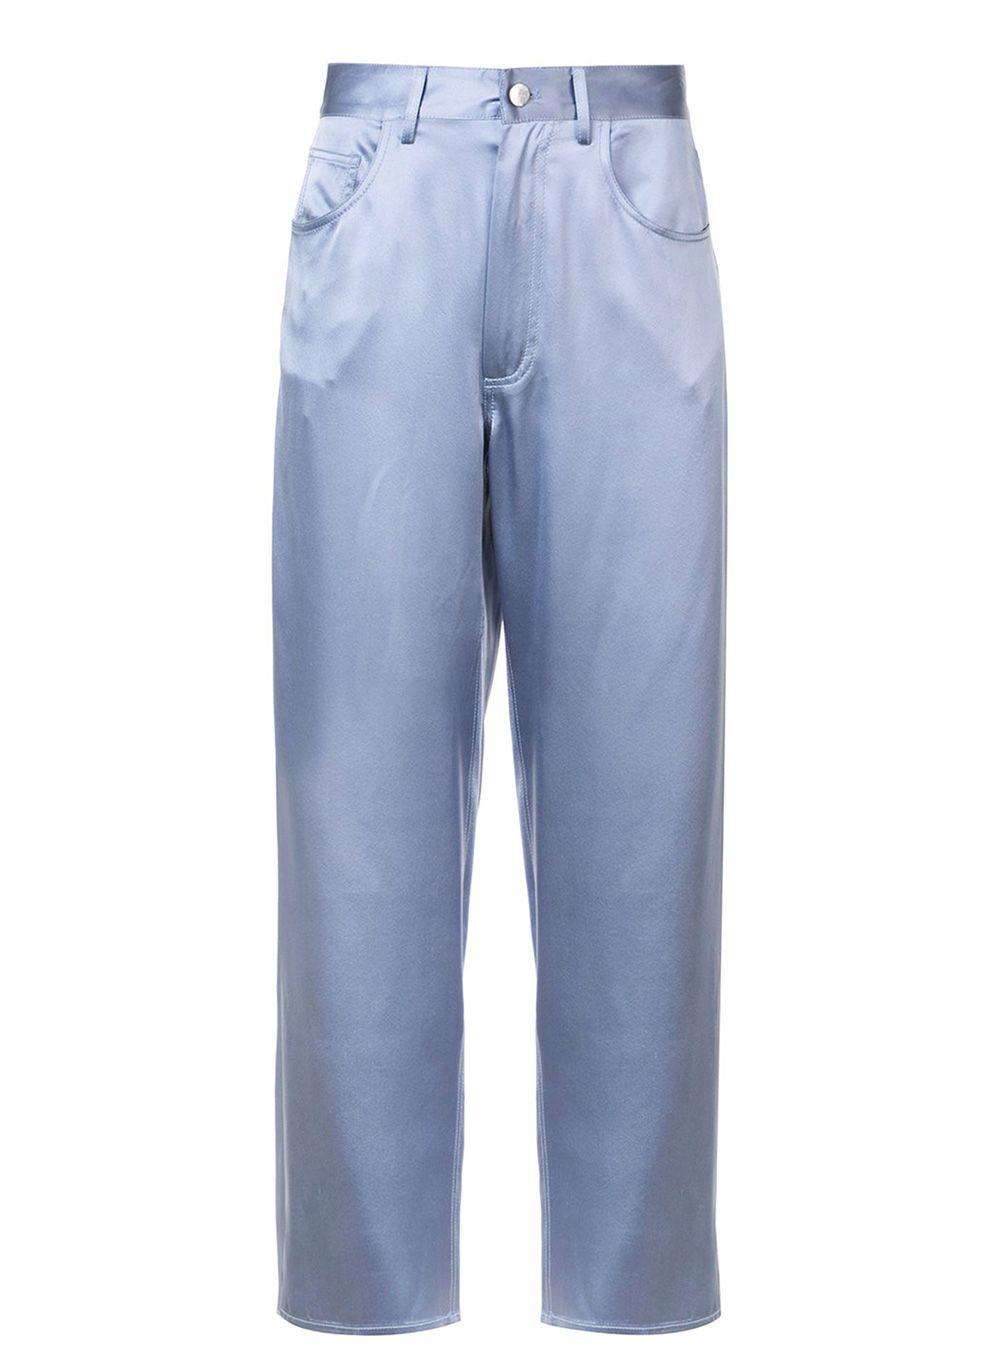 Jeans moda 2019 tendenza Primavera Estate